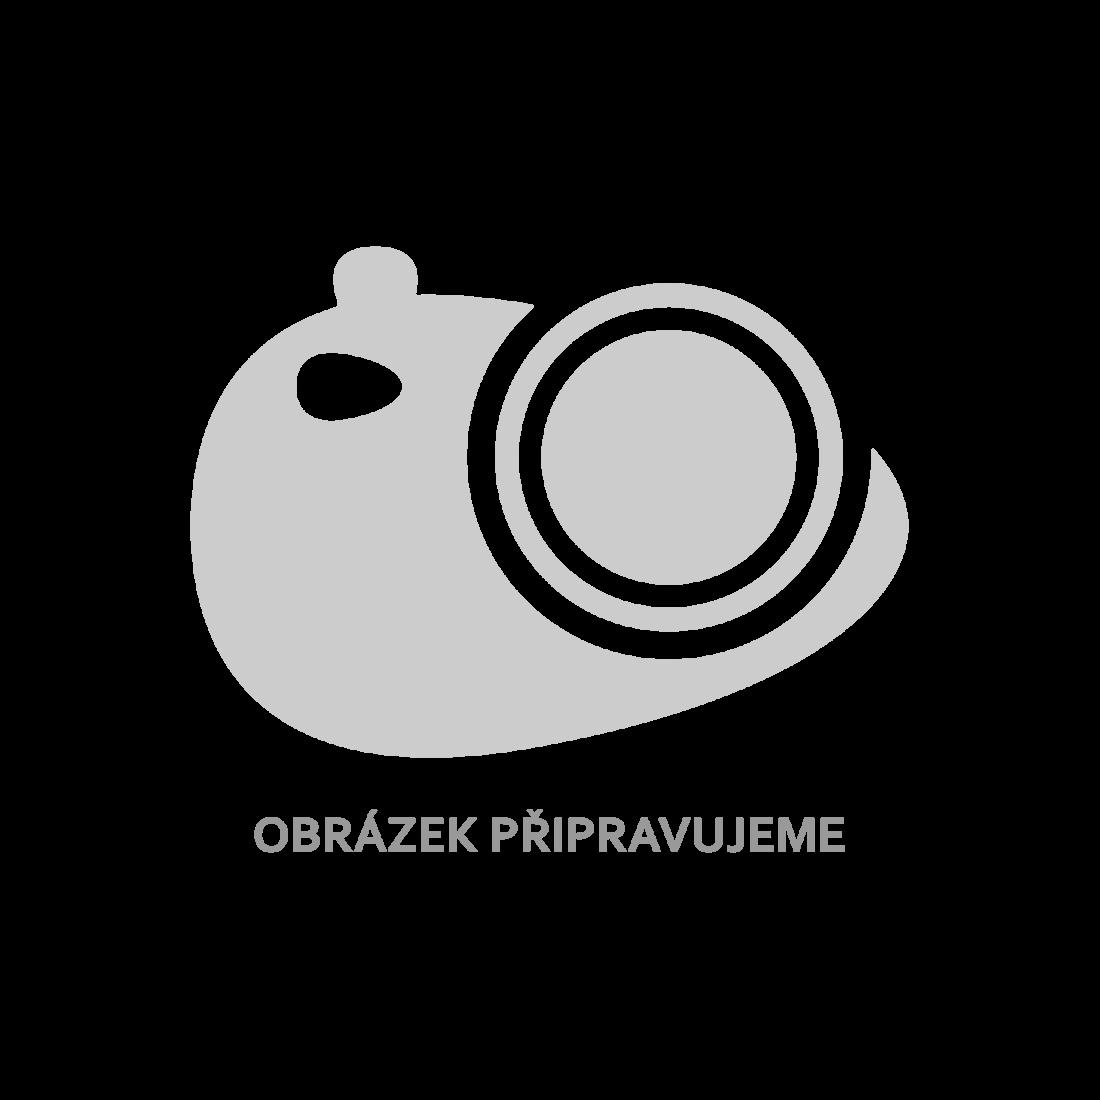 vidaXL Zahradní stůl šedý 90 x 90 x 75 cm polyratan a masivní akácie [46106]